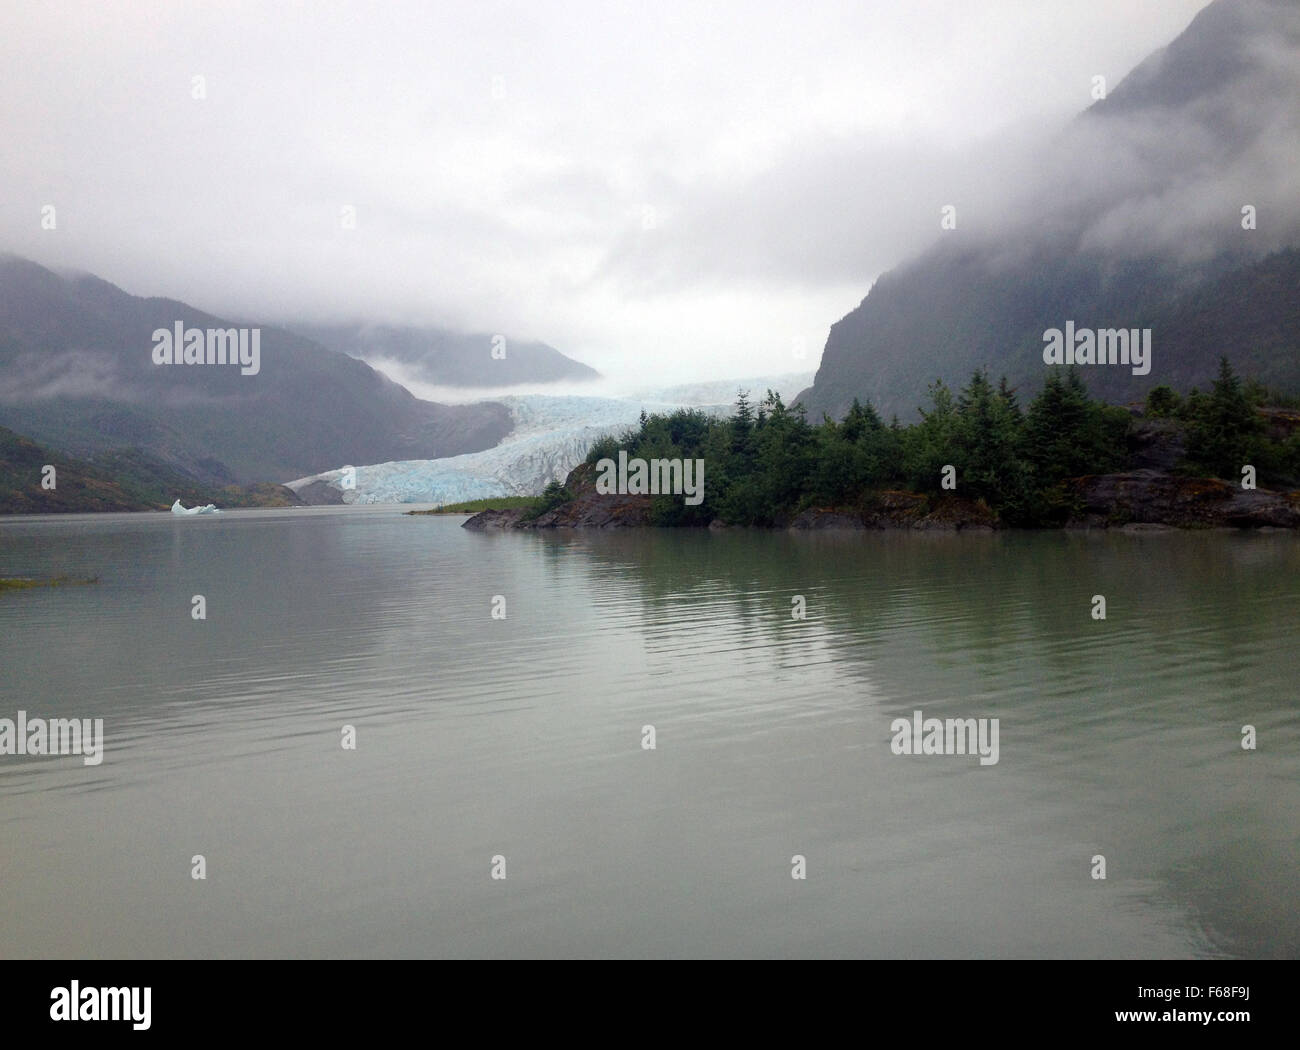 A wet day at Mendenhall Glacier, Juneau, Alaska. - Stock Image